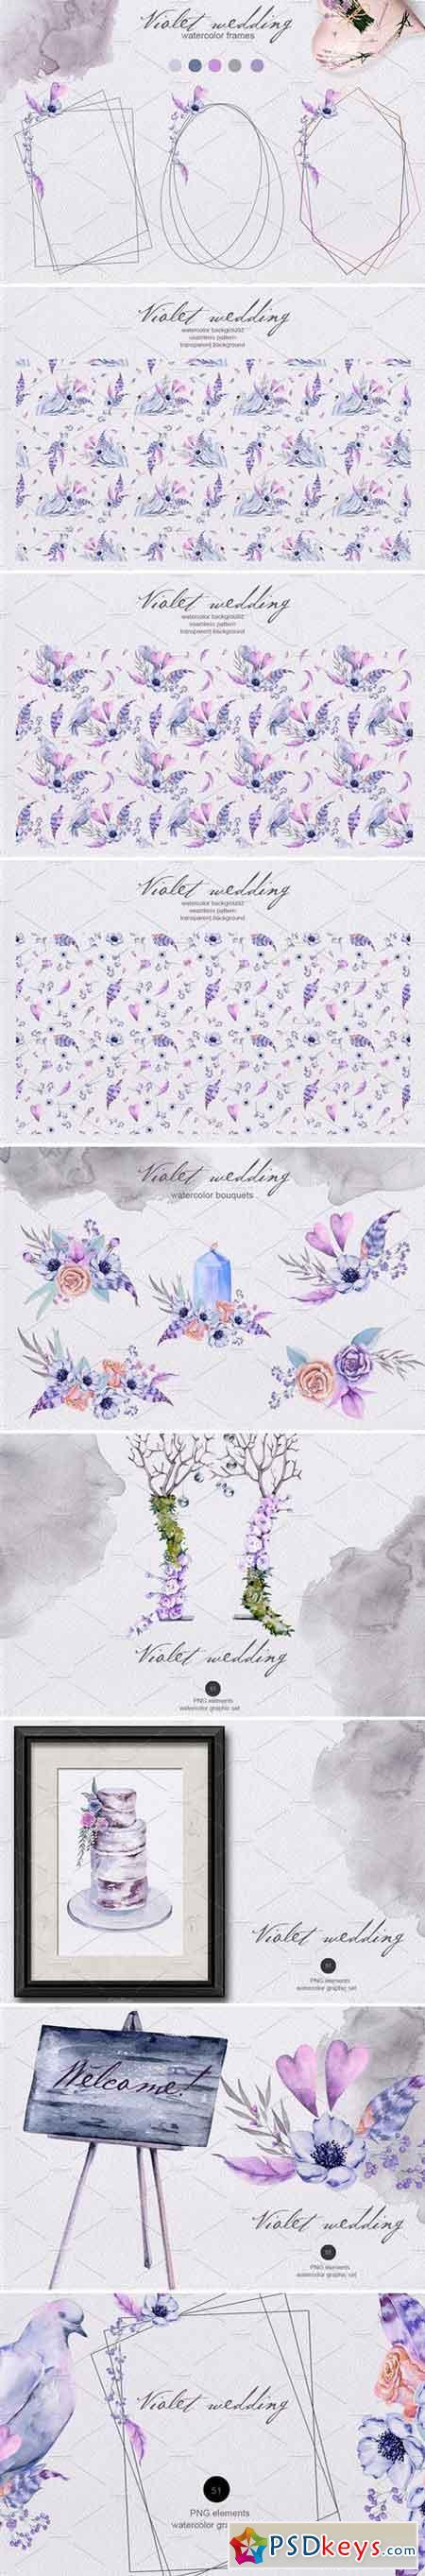 violet wedding 2486515